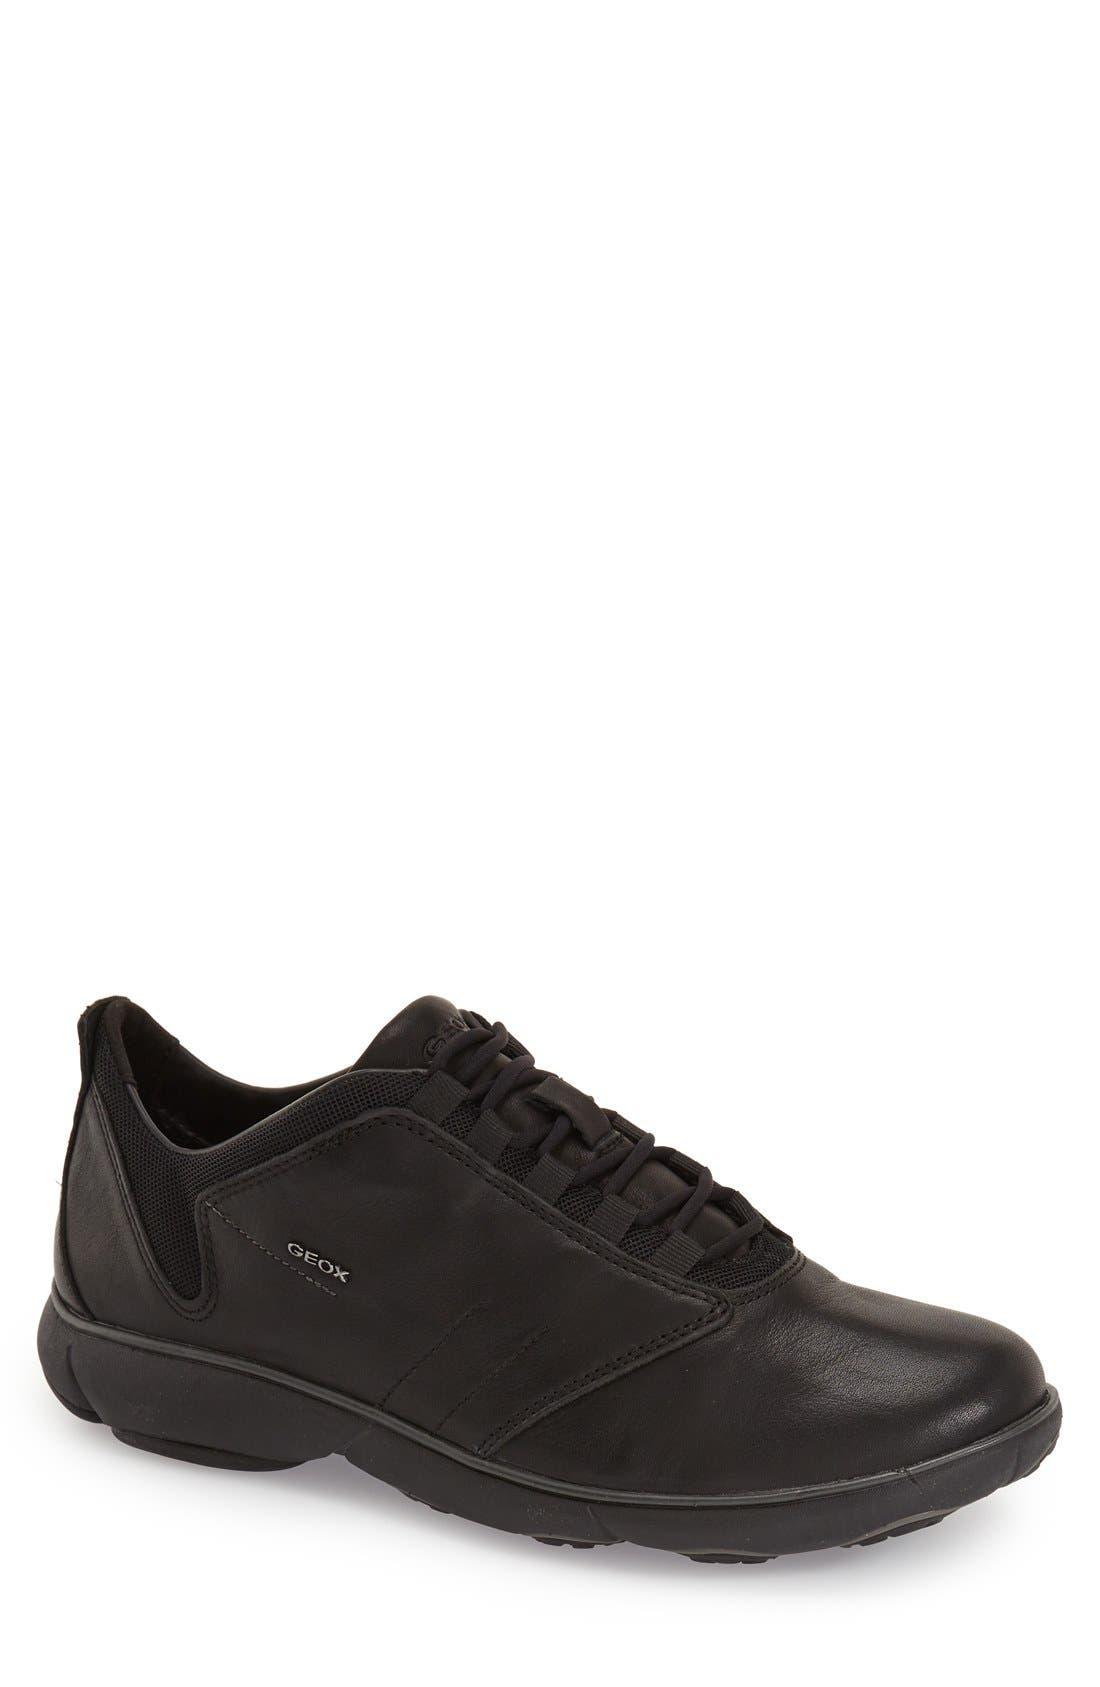 Nebula 11 Sneaker,                             Main thumbnail 1, color,                             BLACK OILY LEATHER